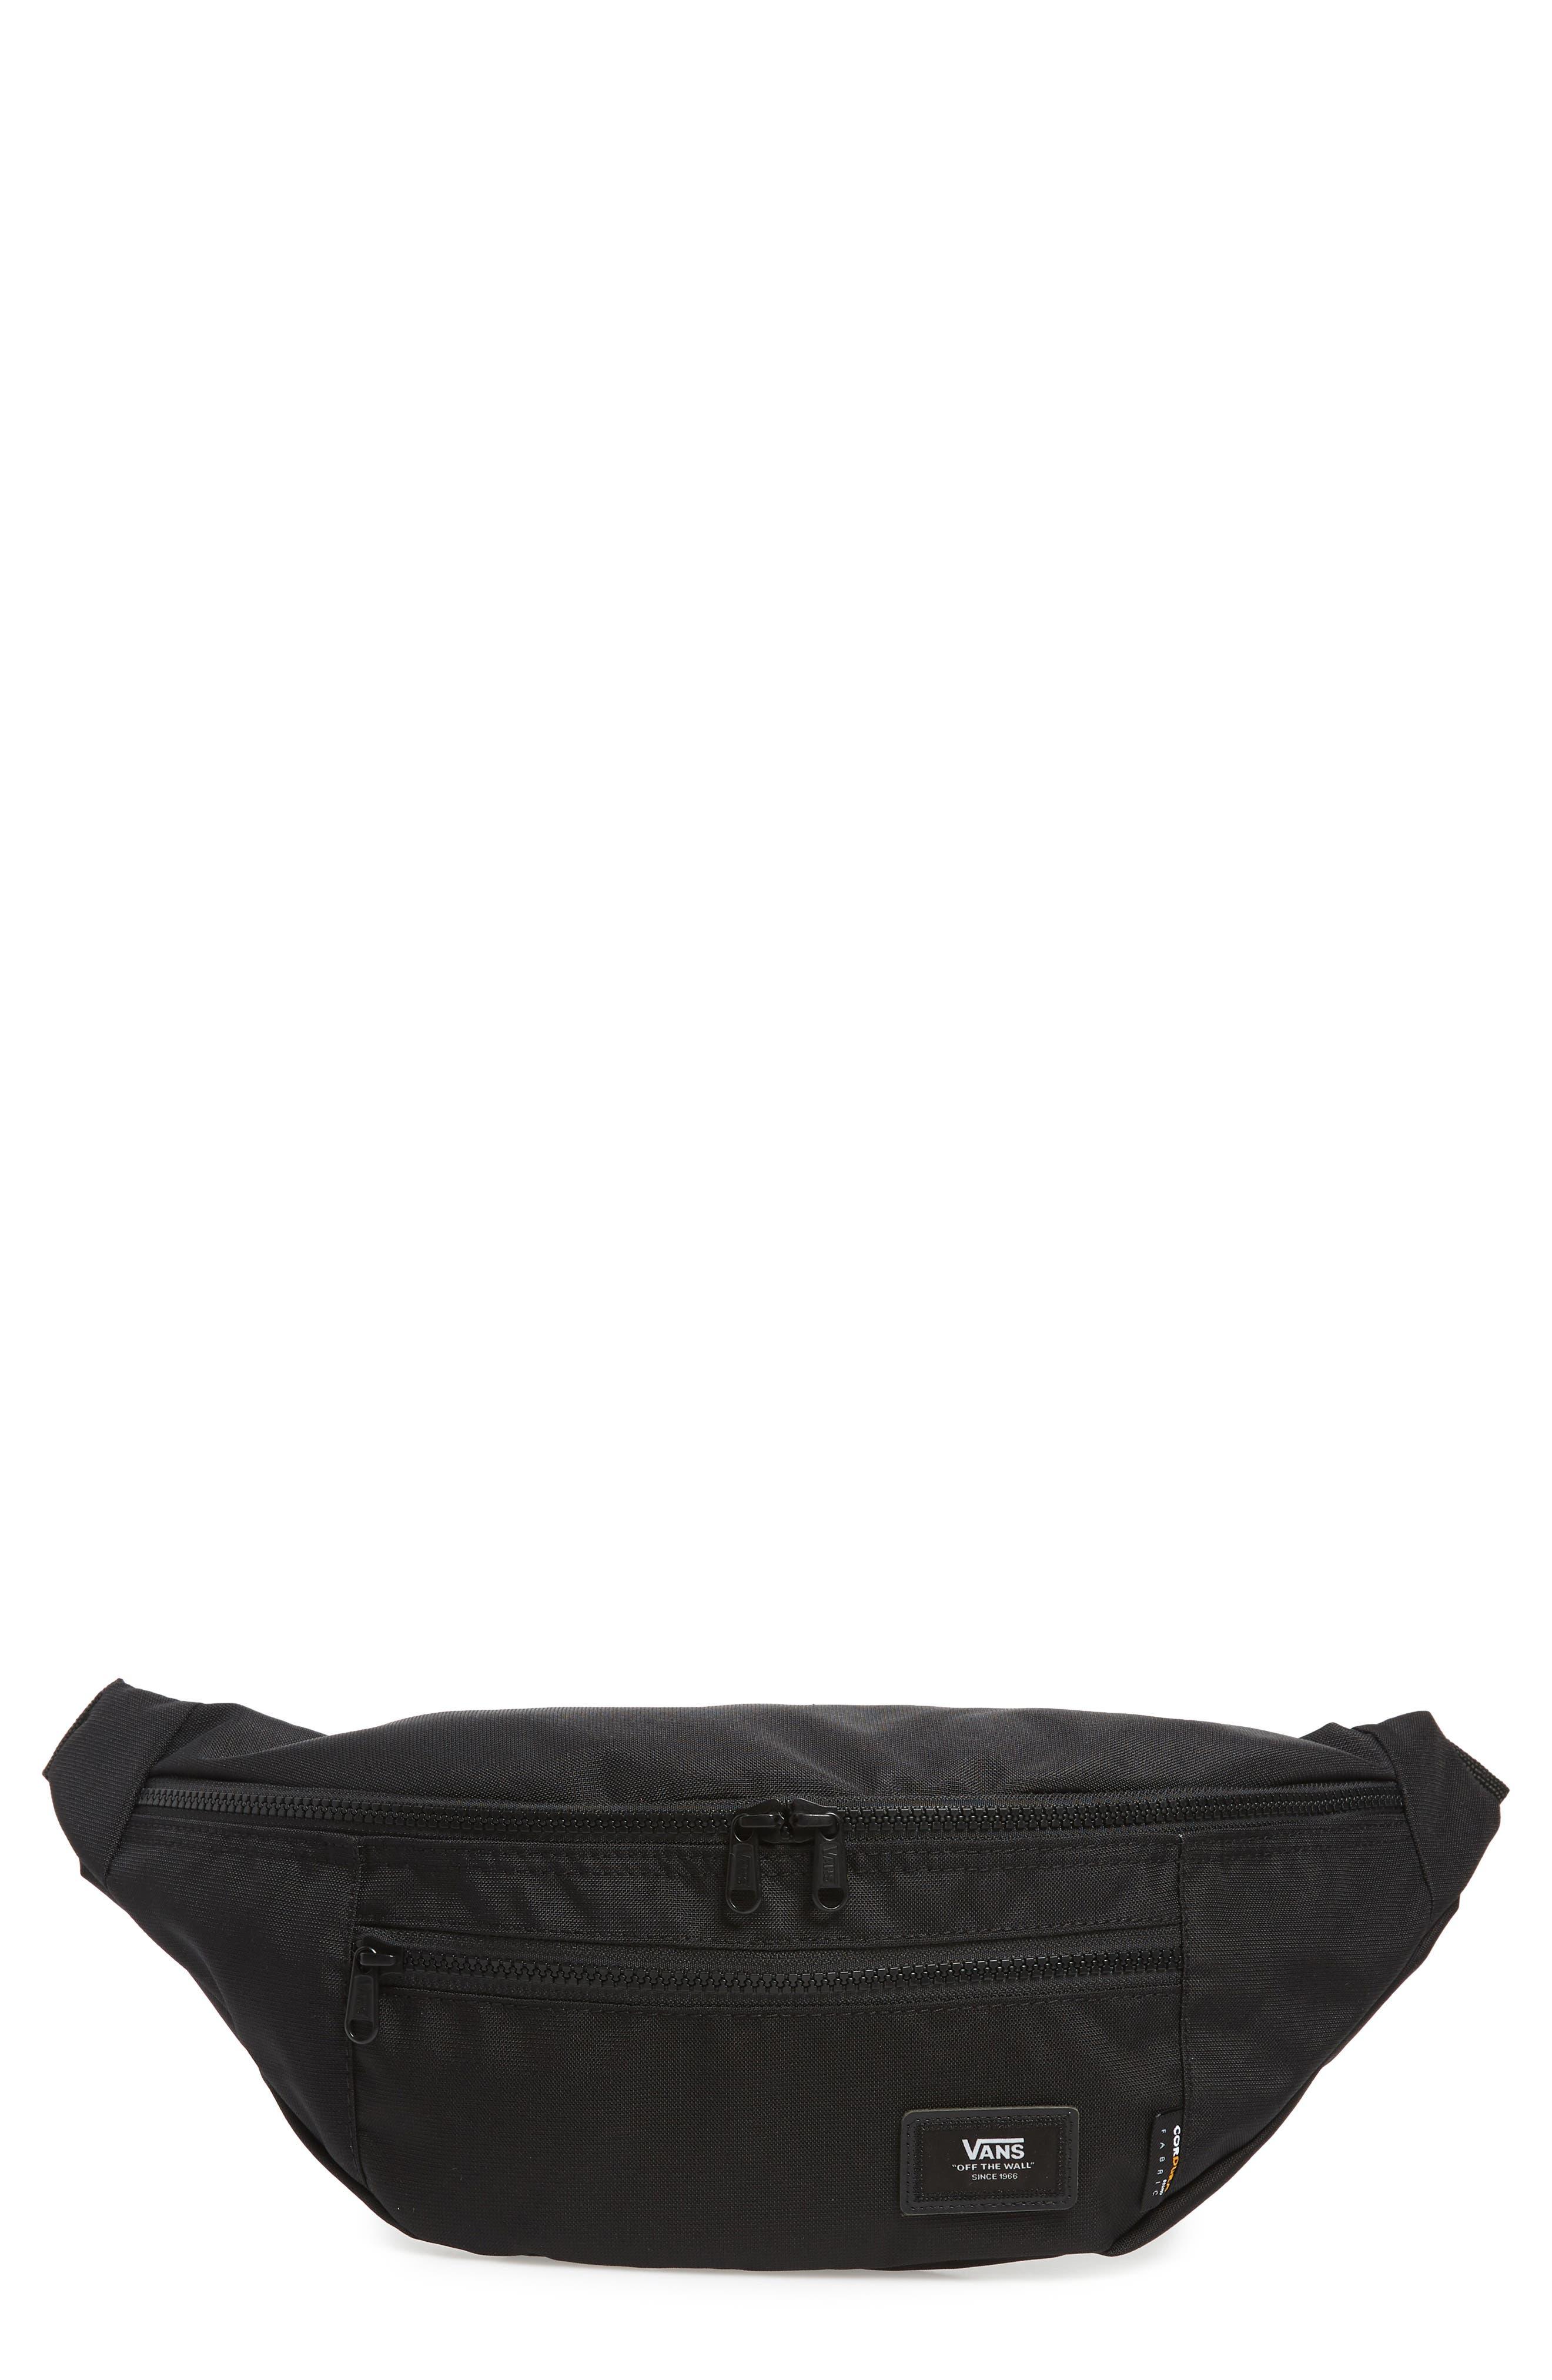 VANS, Ward Water Repellent Waist Pack, Main thumbnail 1, color, BLACK